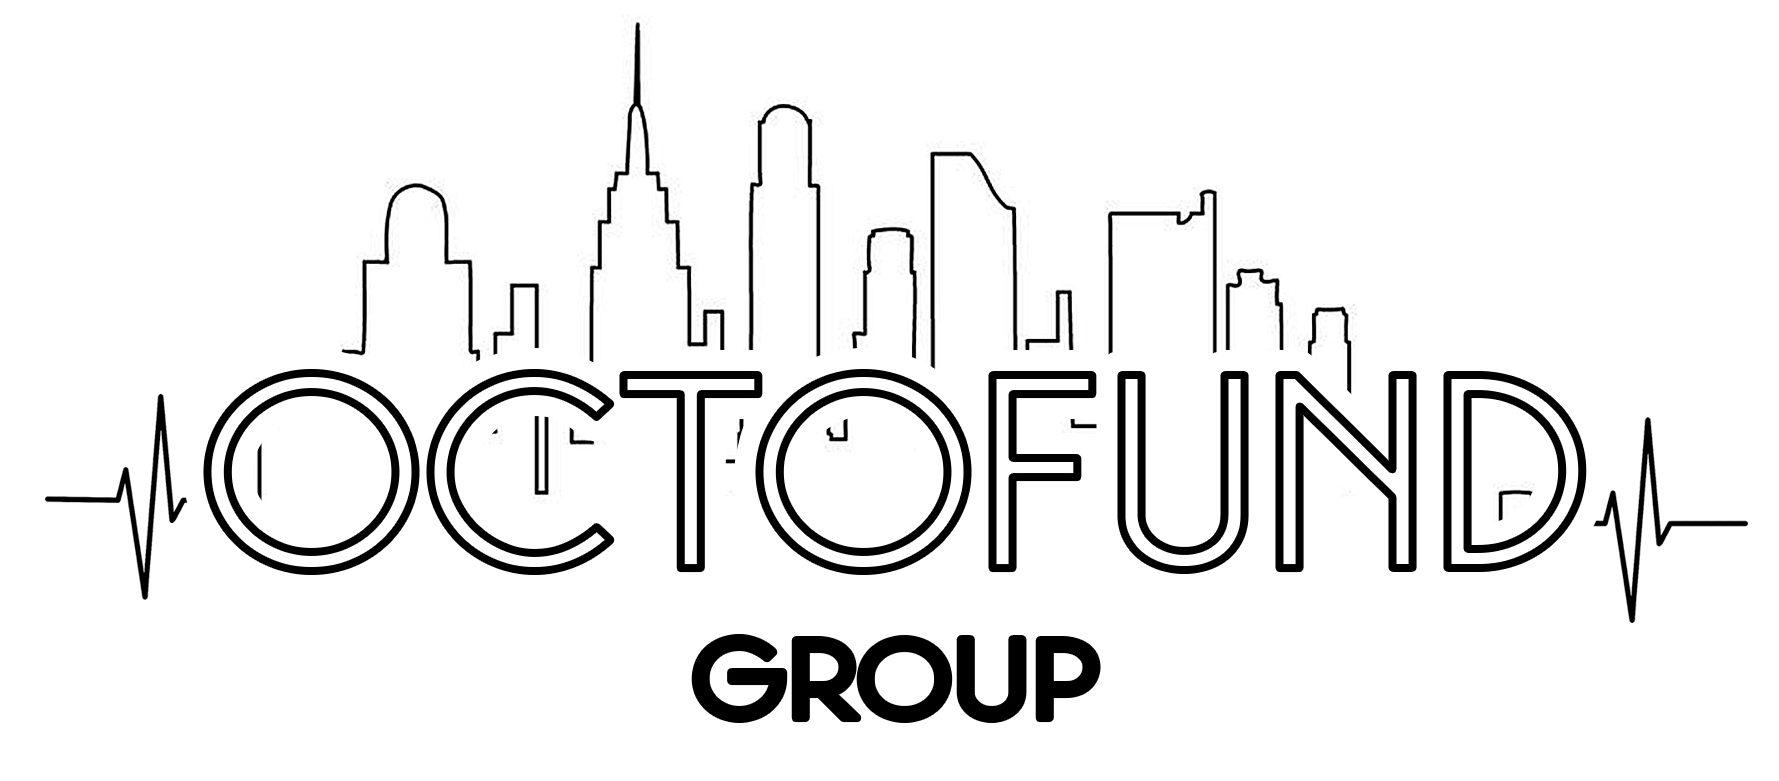 Octofund Group